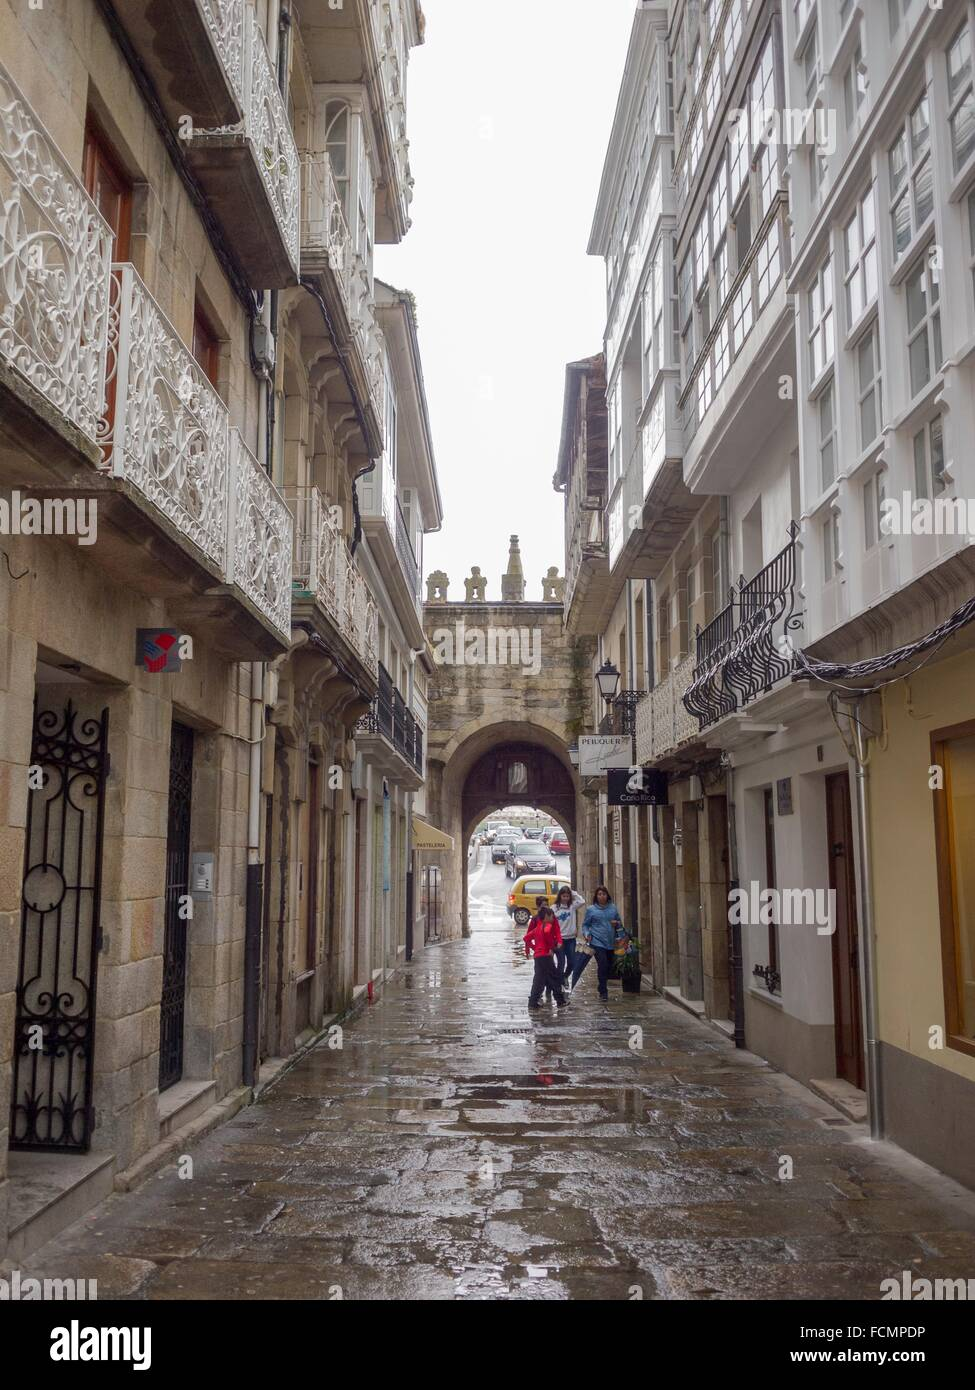 Puerta de carlos v en vivero o viveiro lugo galicia for Viveros en lugo